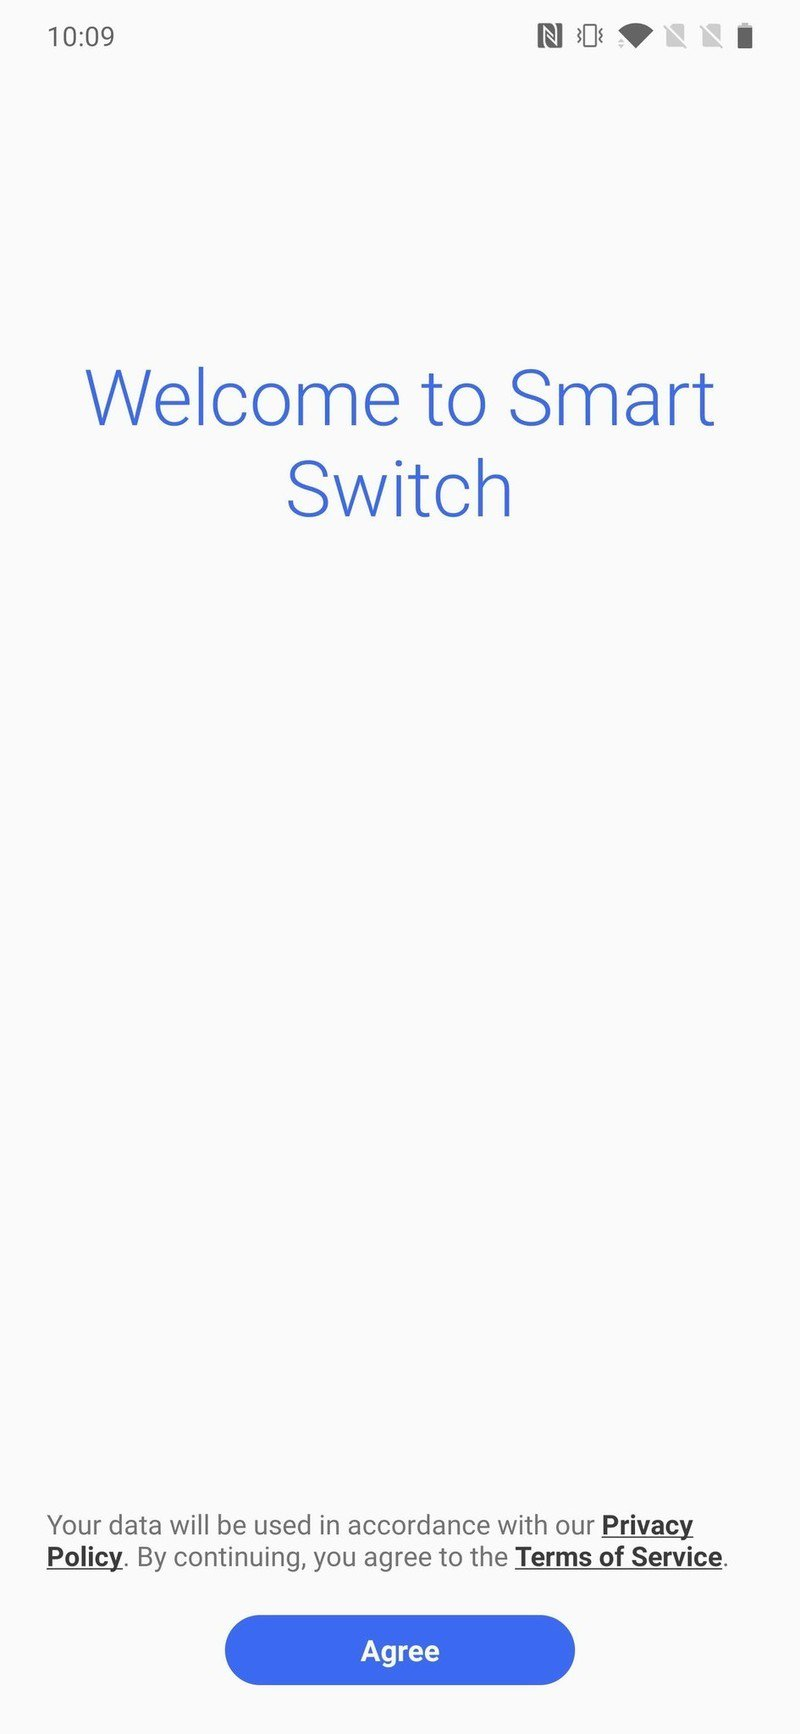 samsung-smart-switch-joe-1.jpg?itok=D27X